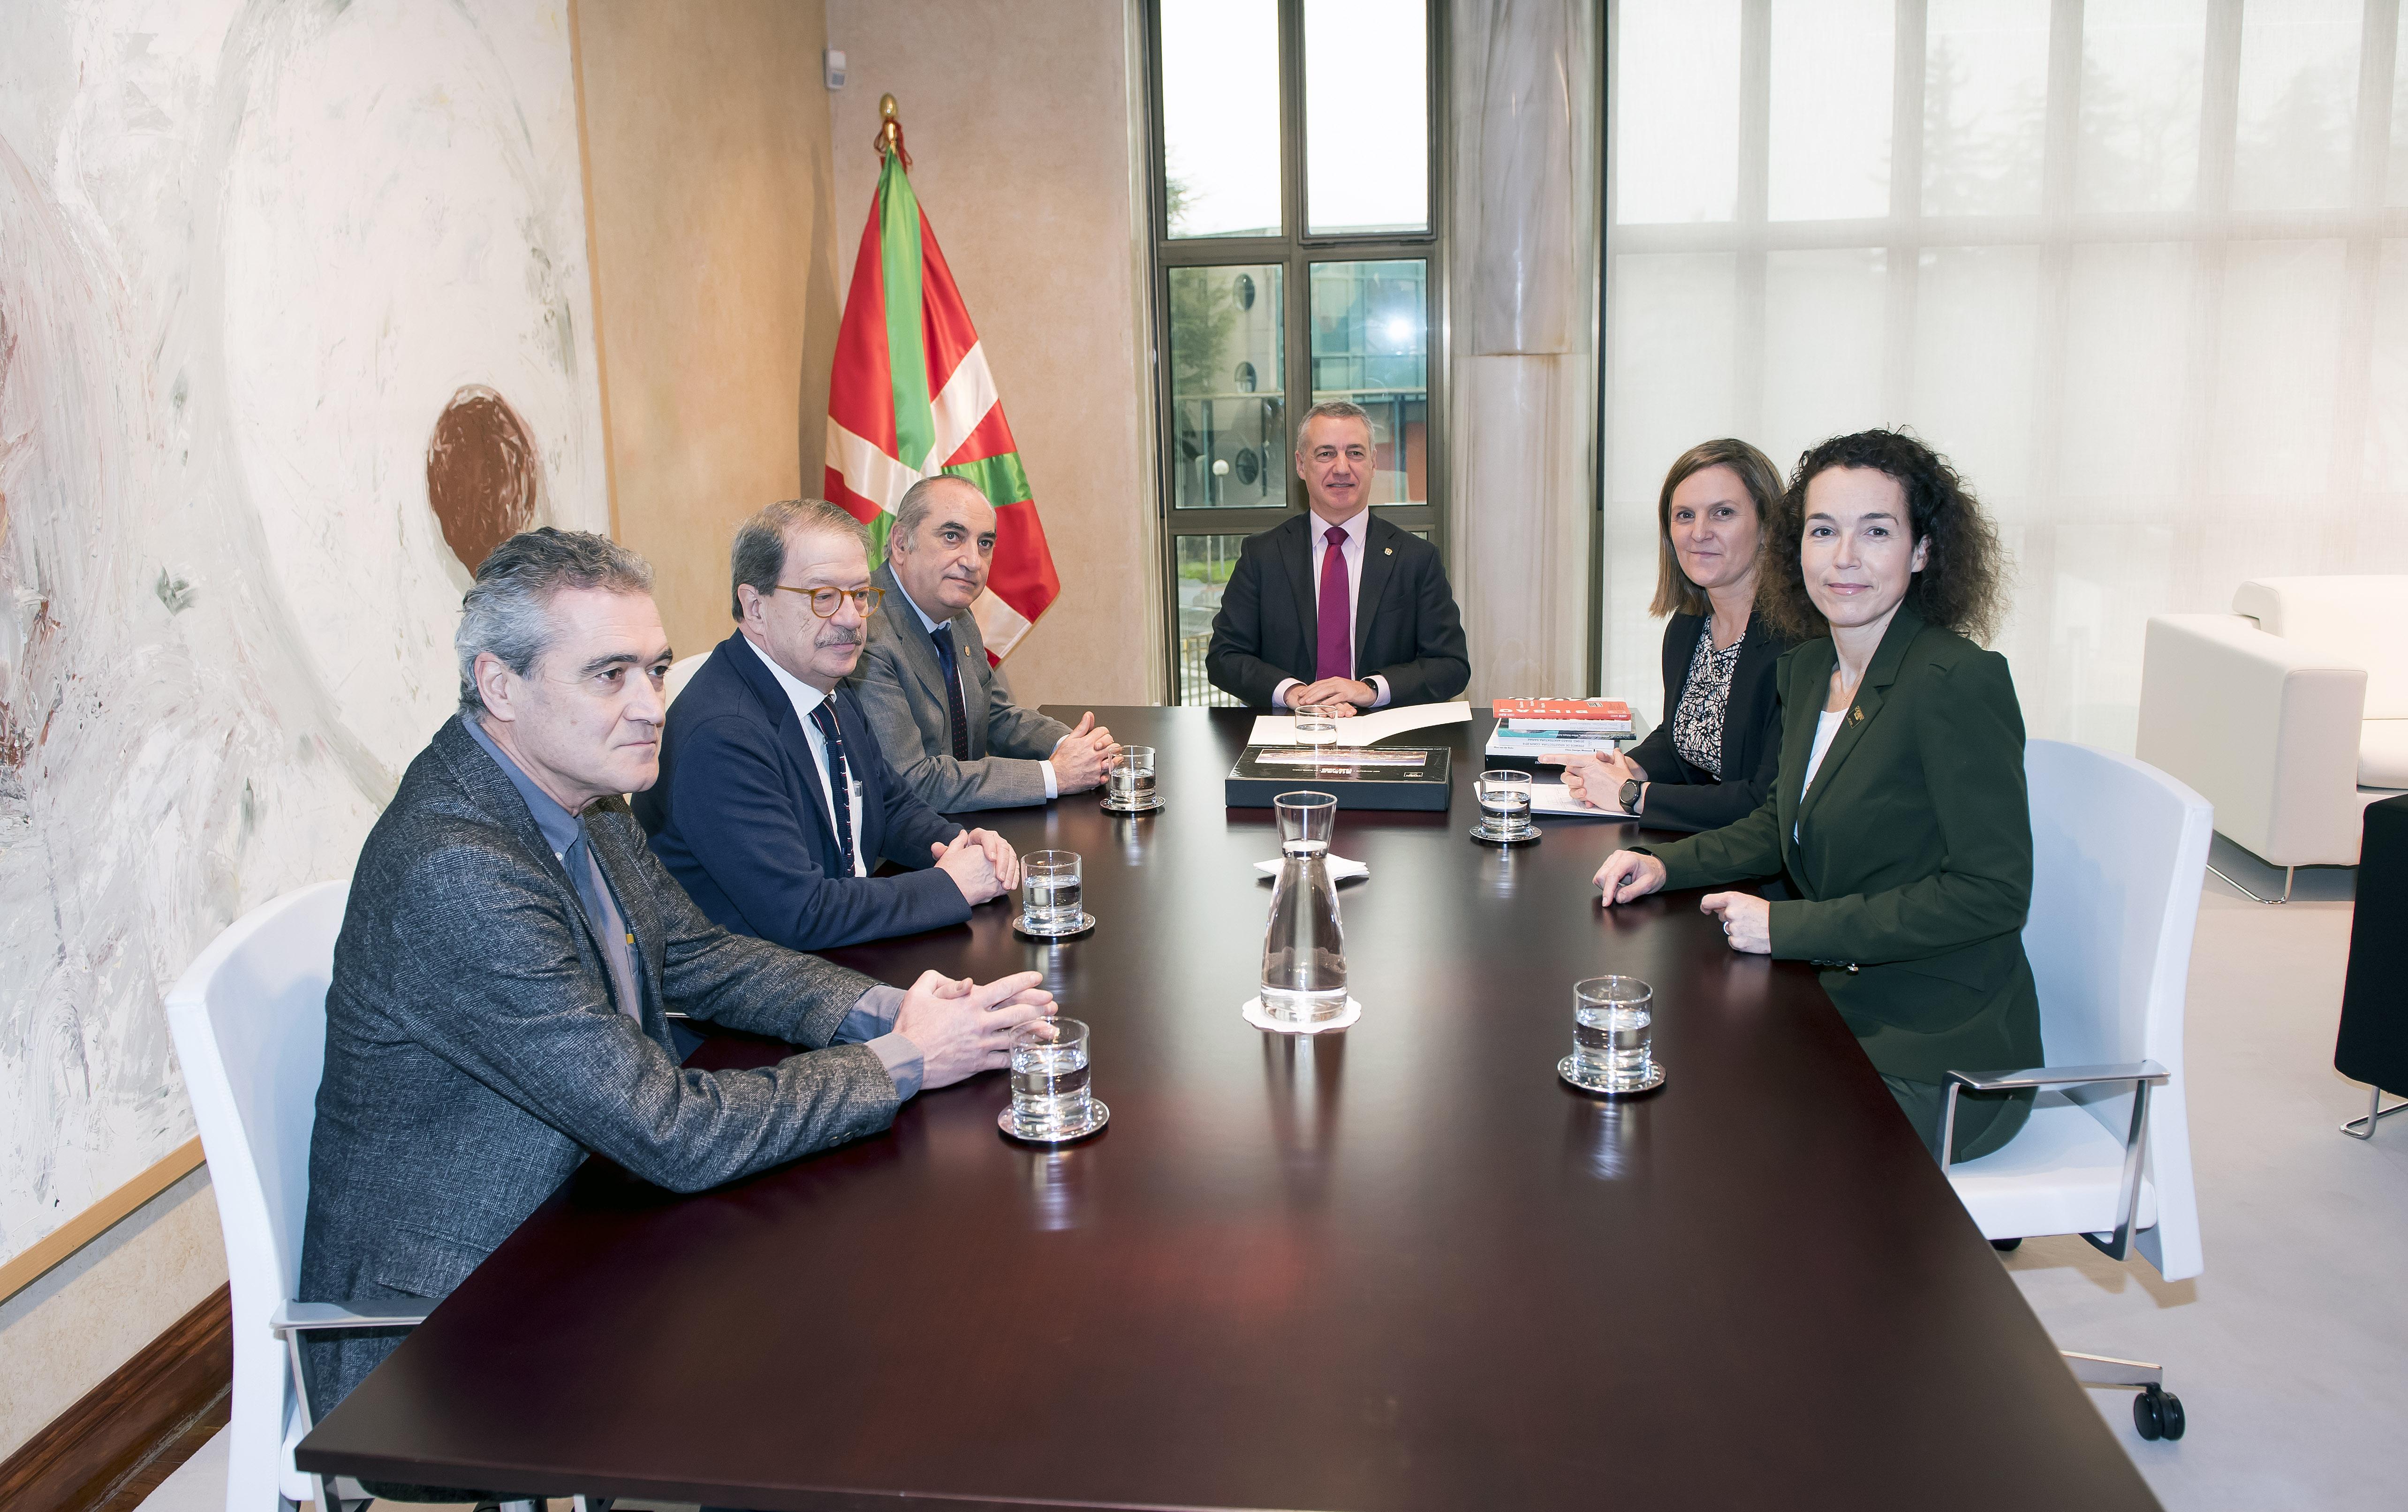 El Lehendakari ha recibido a responsables del Colegio Oficial de Arquitectos Vasco-Navarro